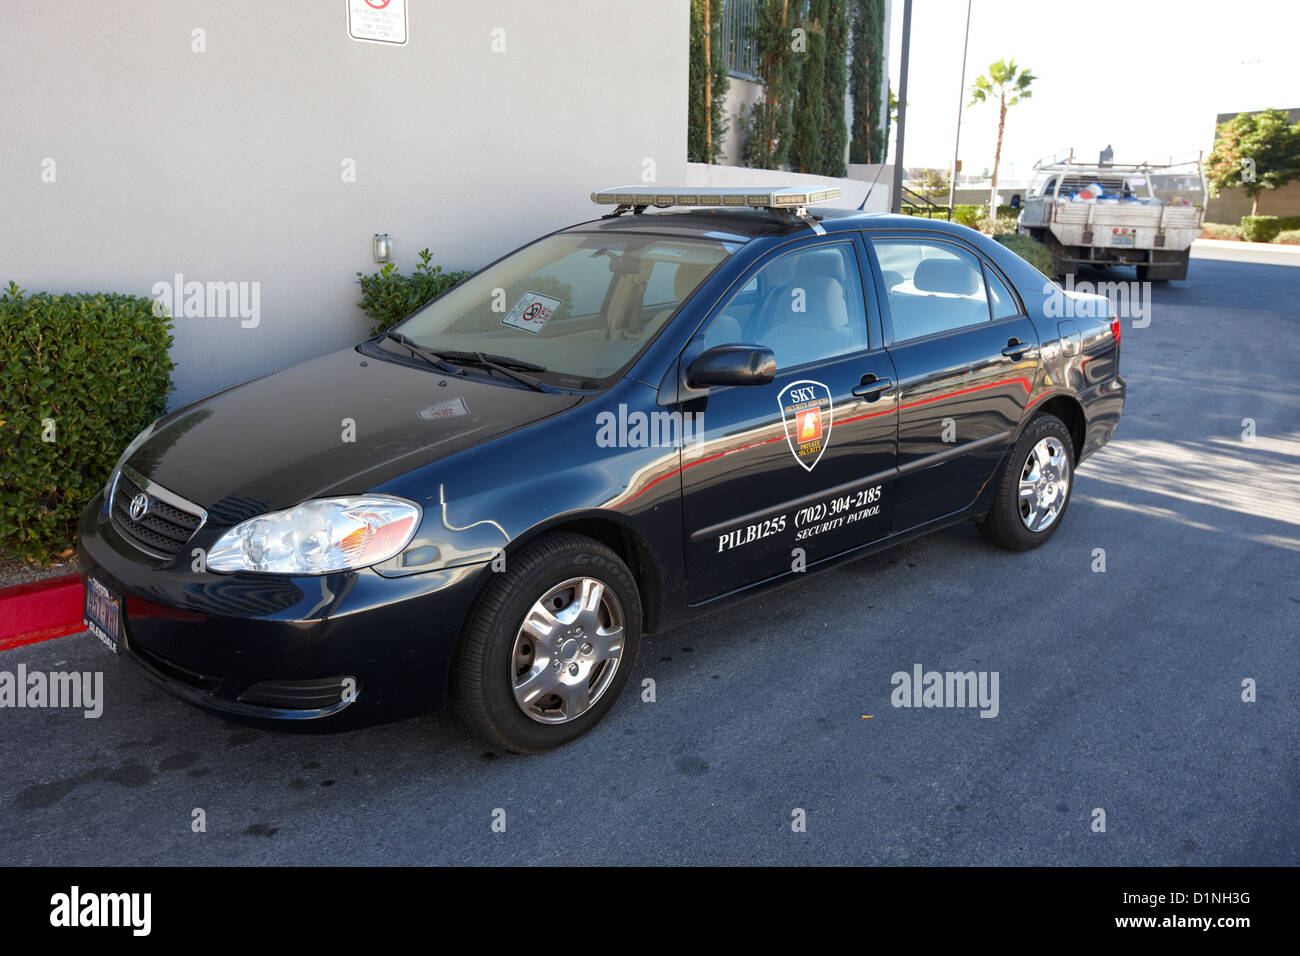 private security company patrol car vehicle Las Vegas Nevada USA - Stock Image